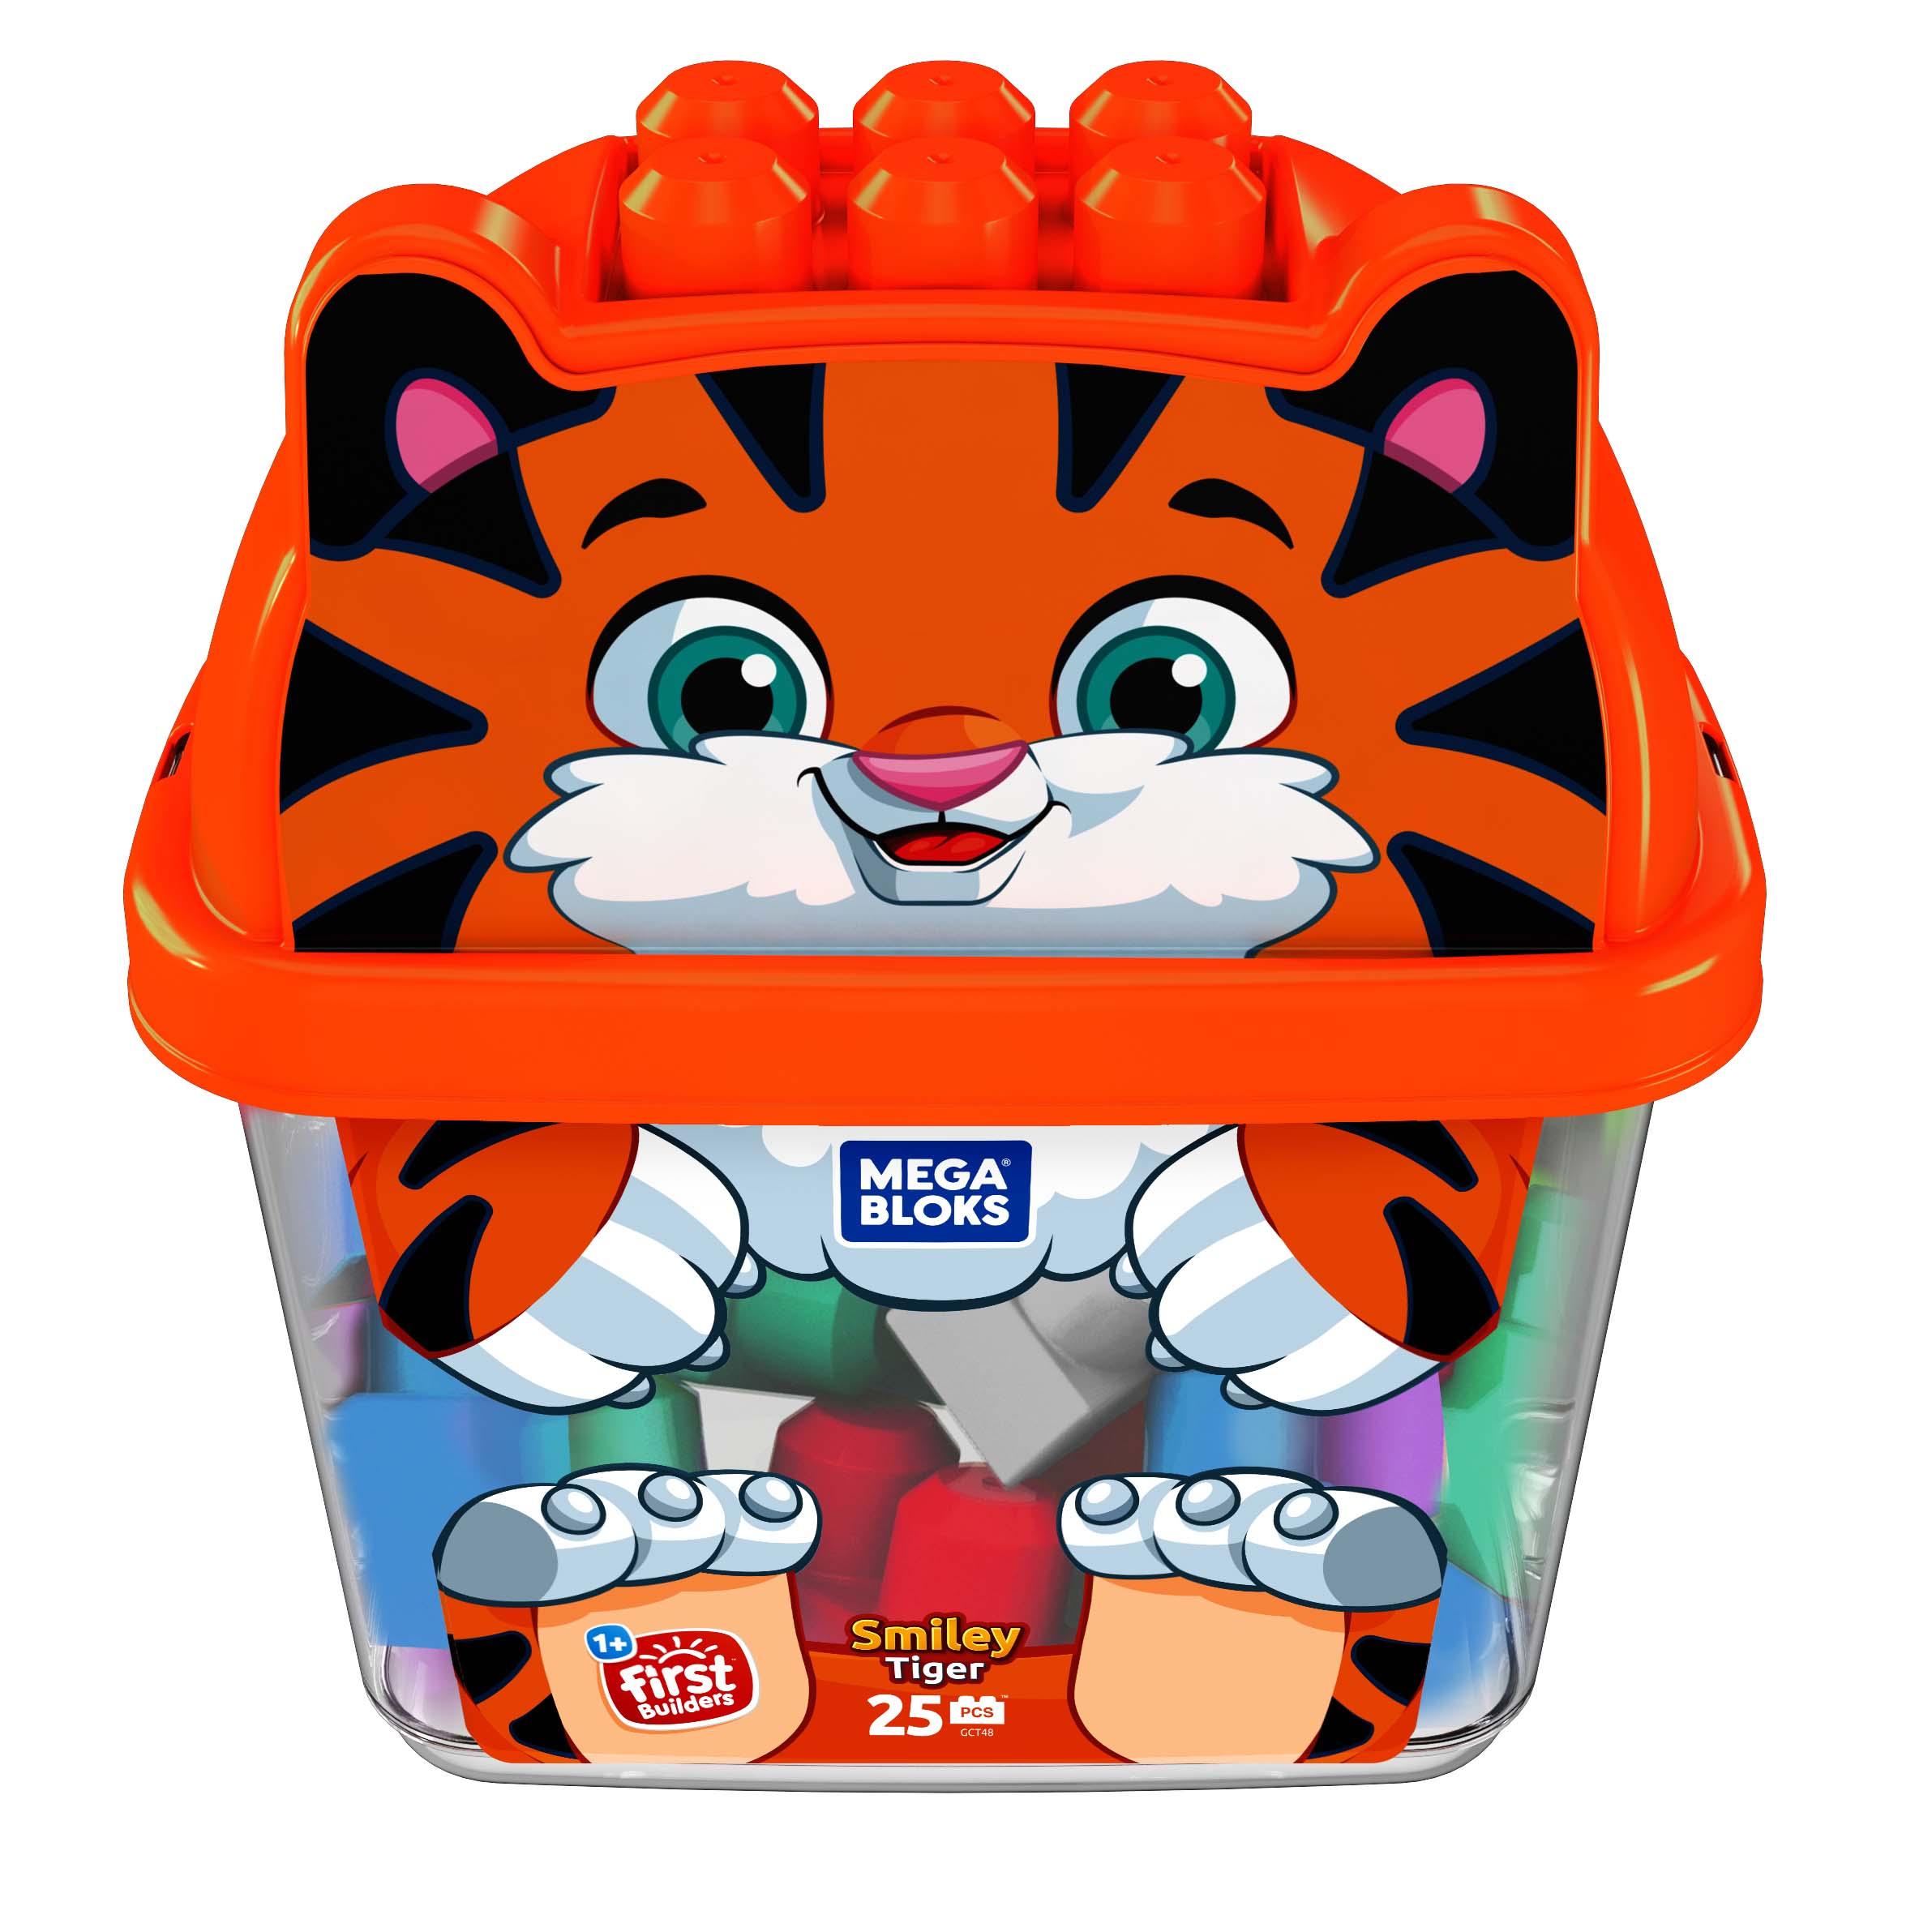 Afbeelding van Mega Blocks Blokken Smiley Tiger